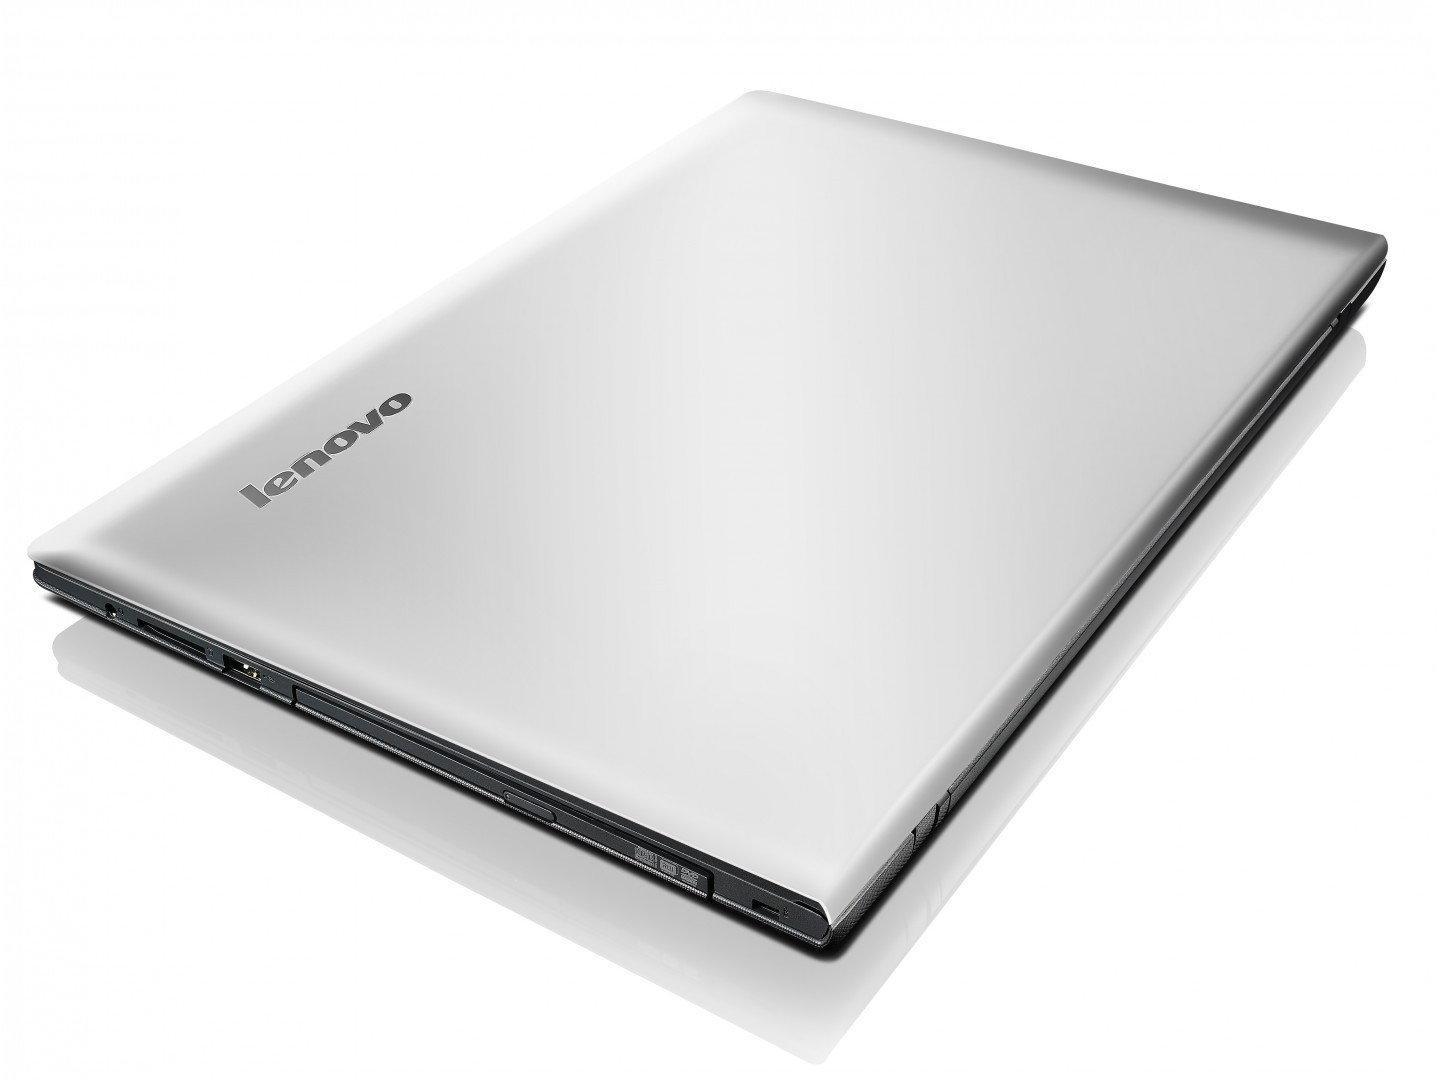 "Lenovo Essential G50-80 15,6"", Core i3 1,9GHz, 4GB RAM, 1000GB HDD (80L000E6PB)"